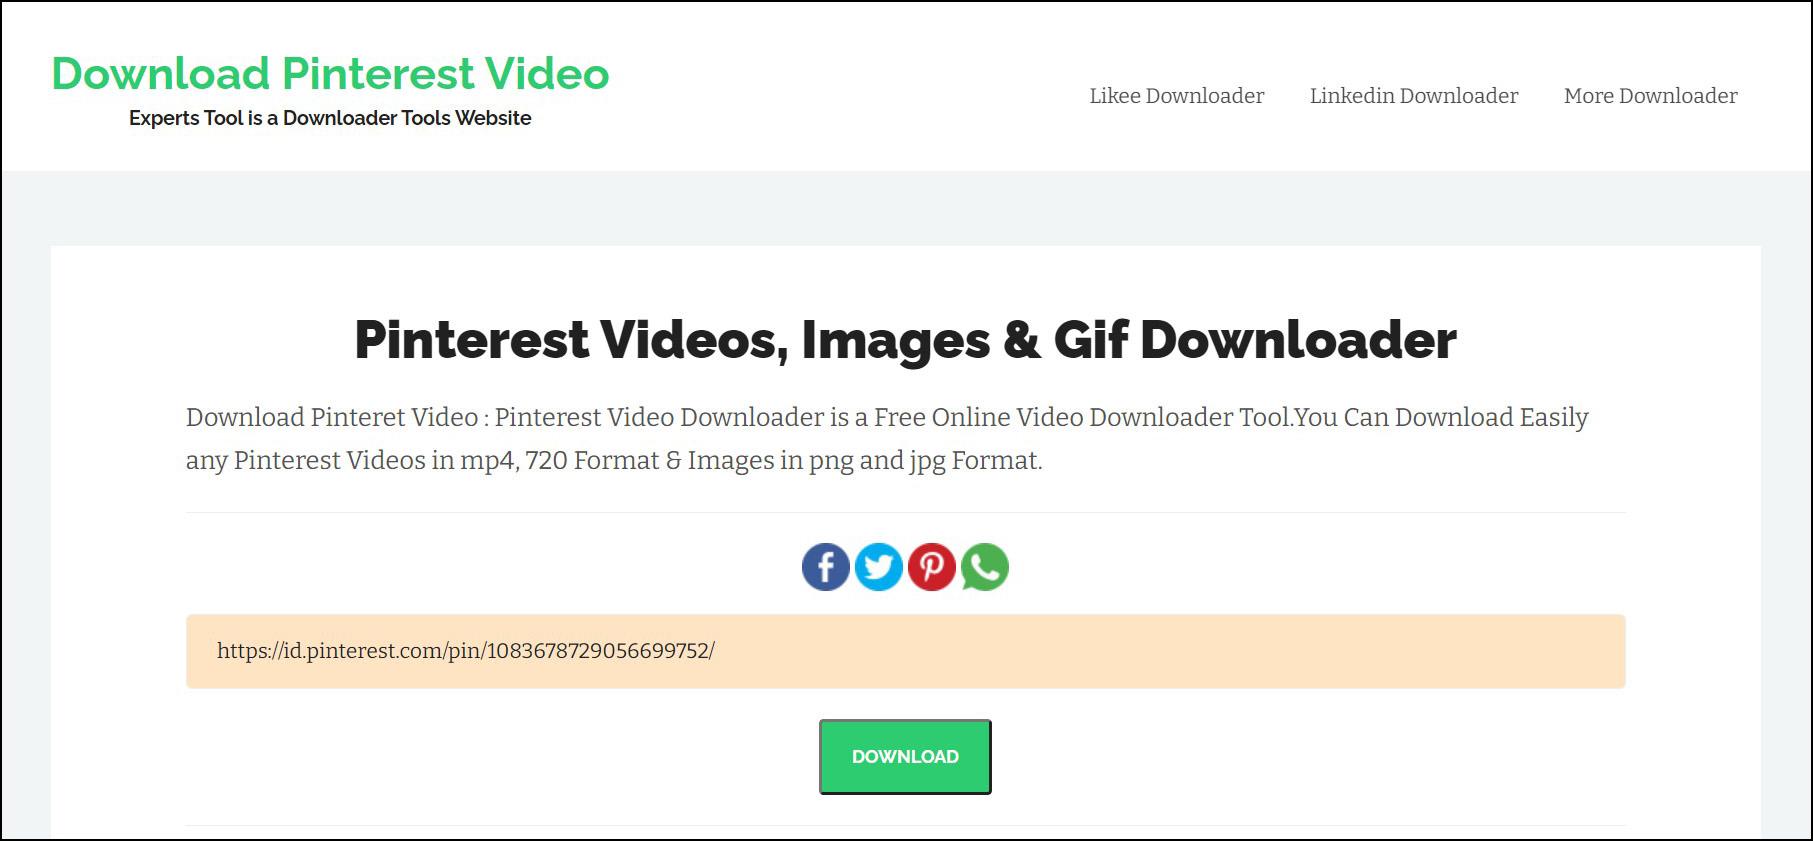 1 Buka halaman Download Pinterest Video